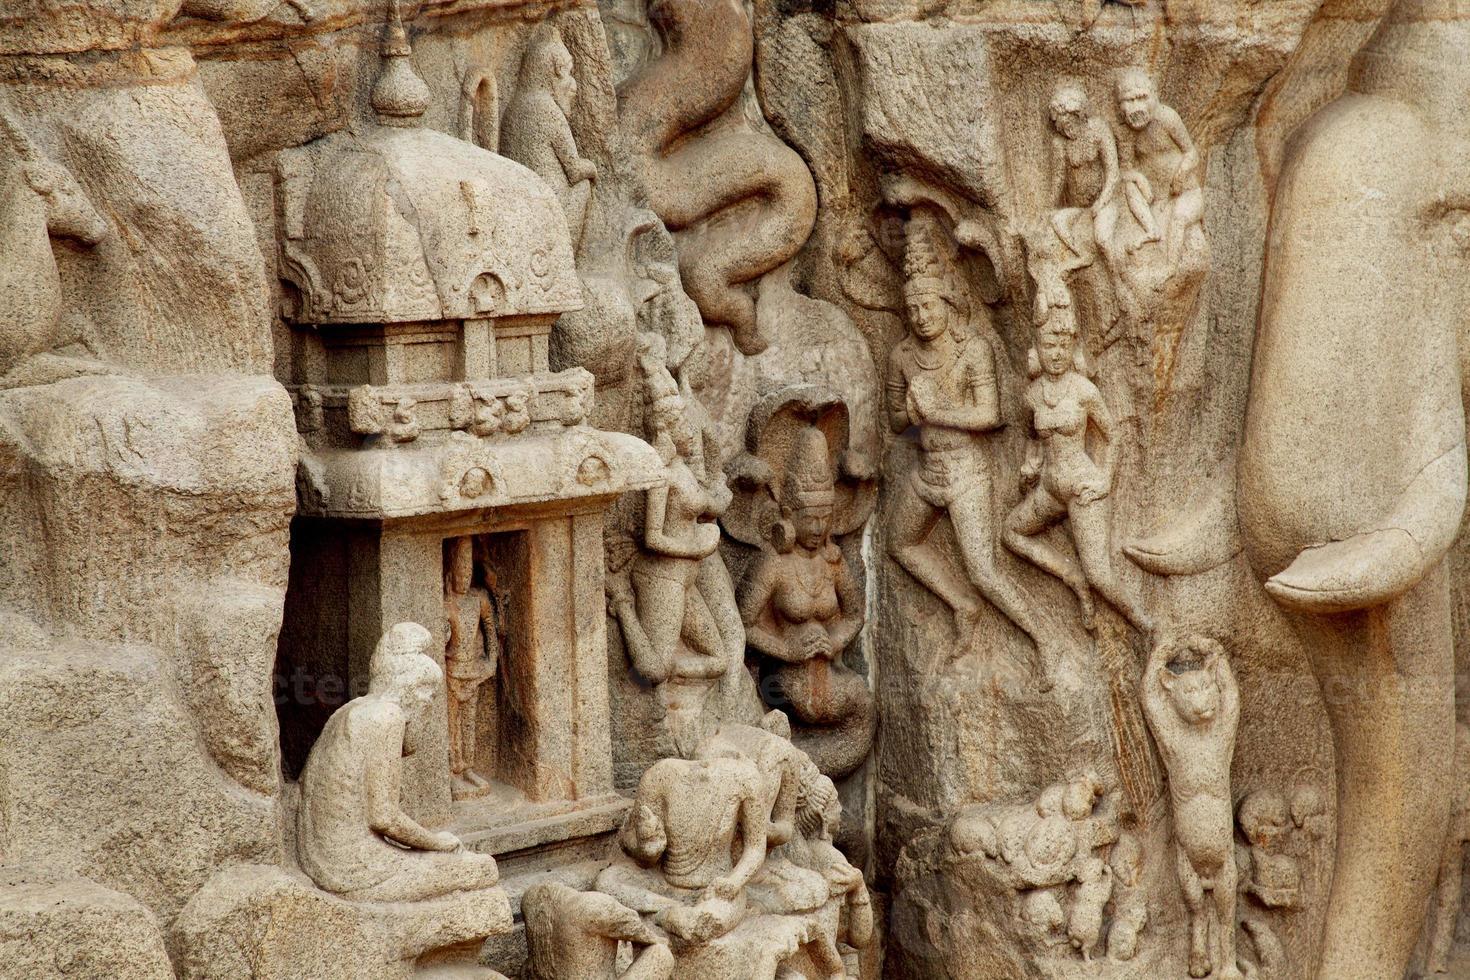 Pénitence d'Arjuna - descente du Gange, Mahabalipuram, Inde photo